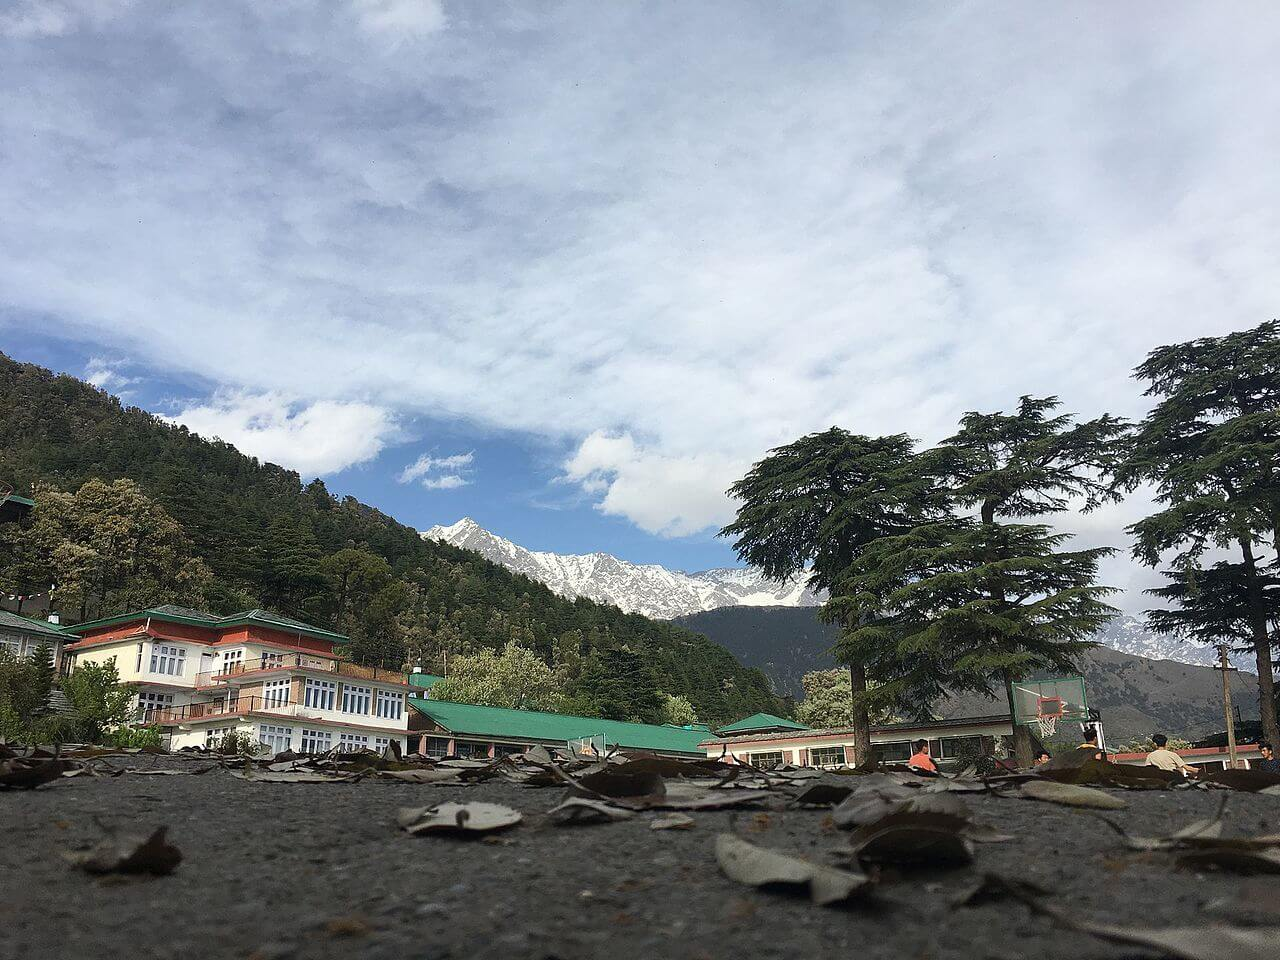 Dharmasala